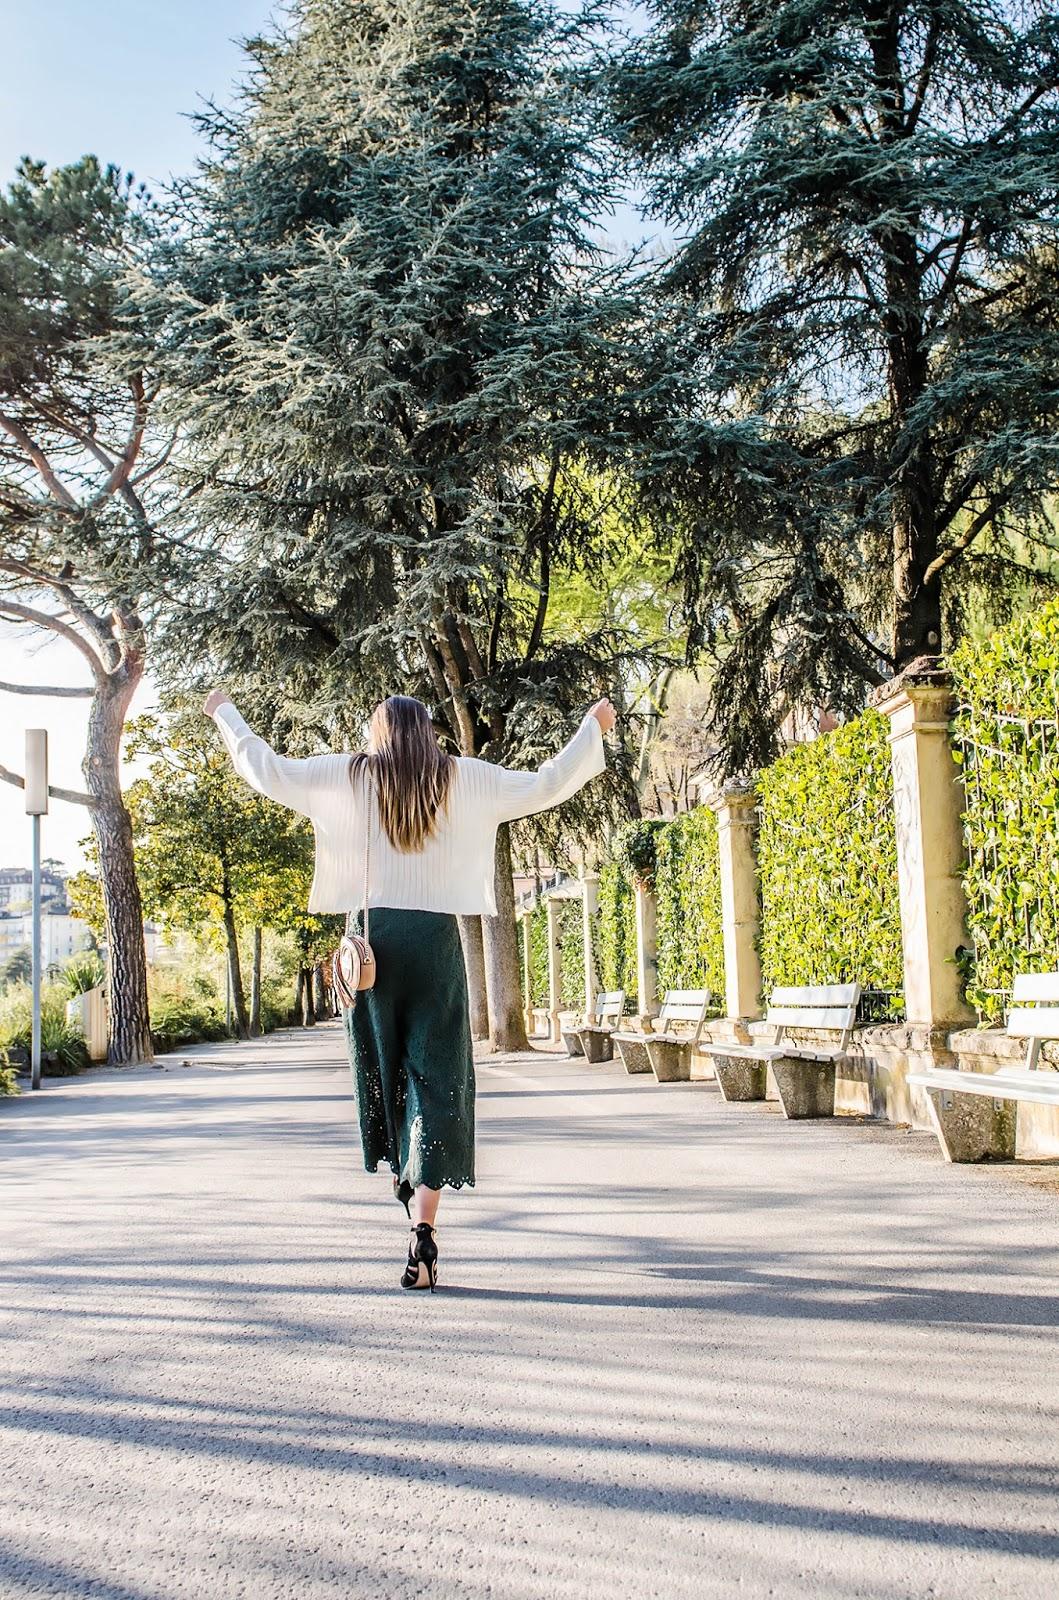 alison liaudat, blog from switzerland, blog mode suisse, swiss fashion blog, stylemoi, H&M, culotte short, Karen Walker, Zara black sandals, outfit of the day, fashion blogger,